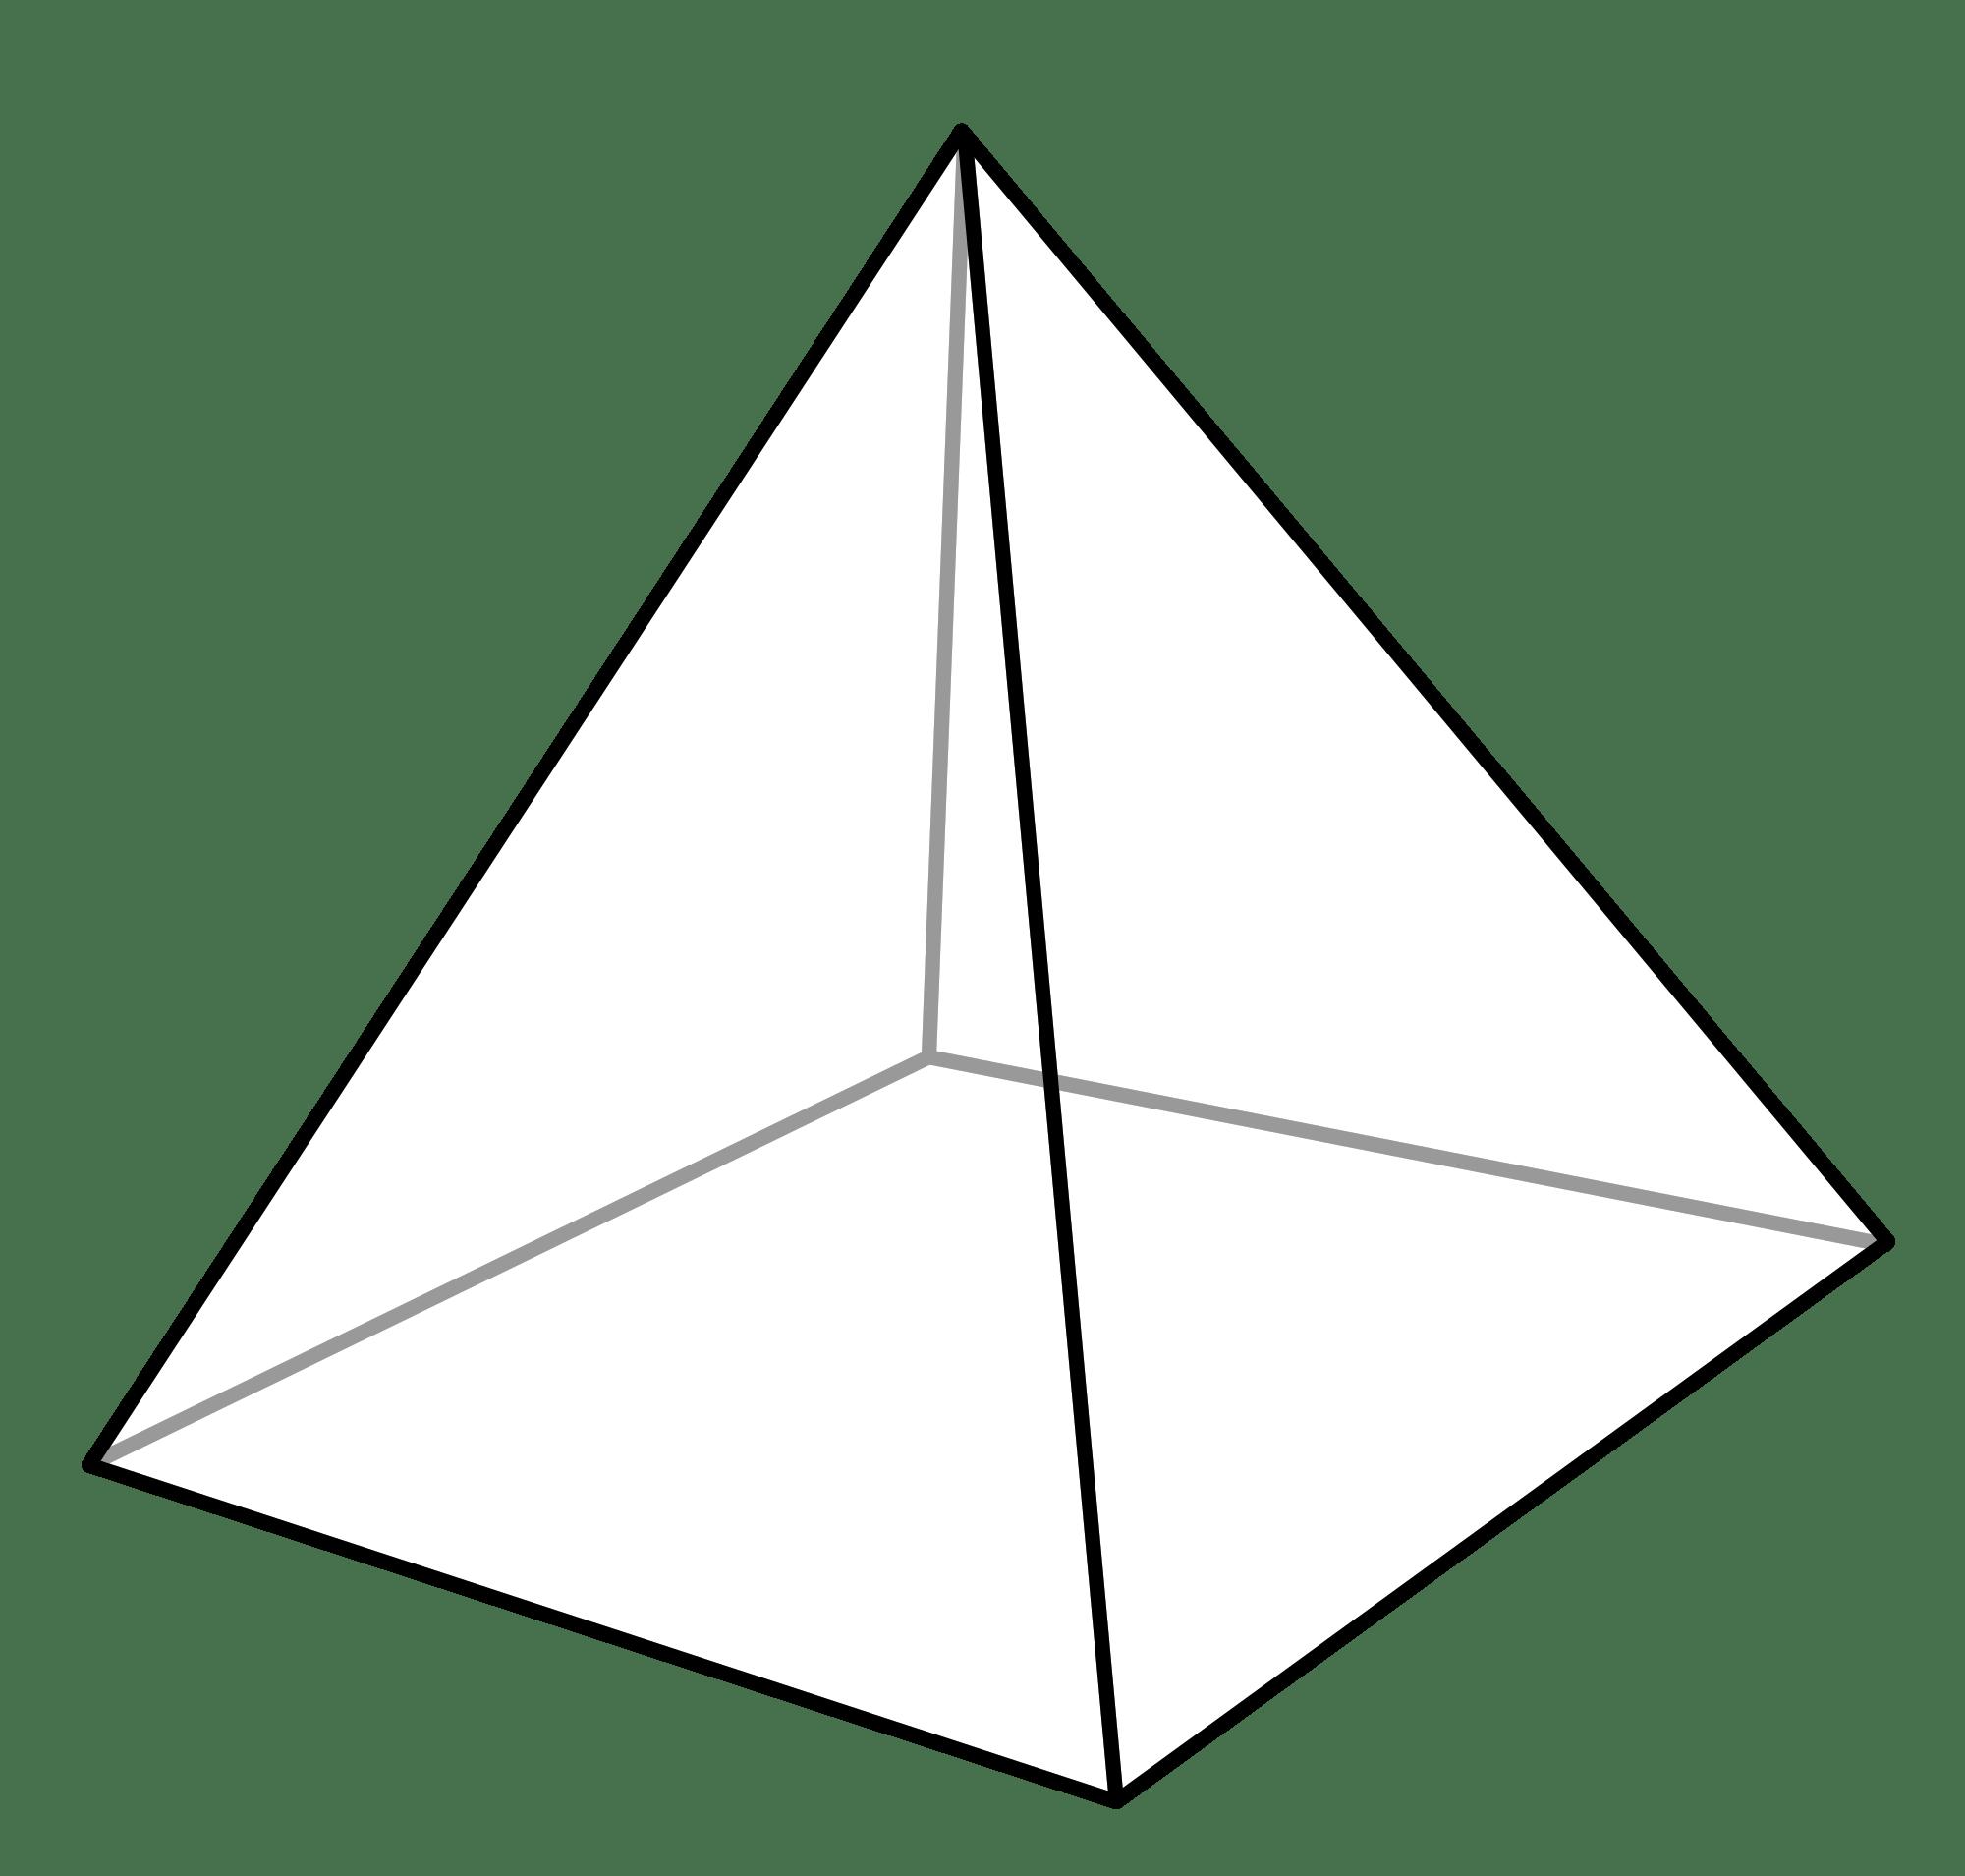 Cone Clipart 3d Pyramid Cone 3d Pyramid Transparent Free